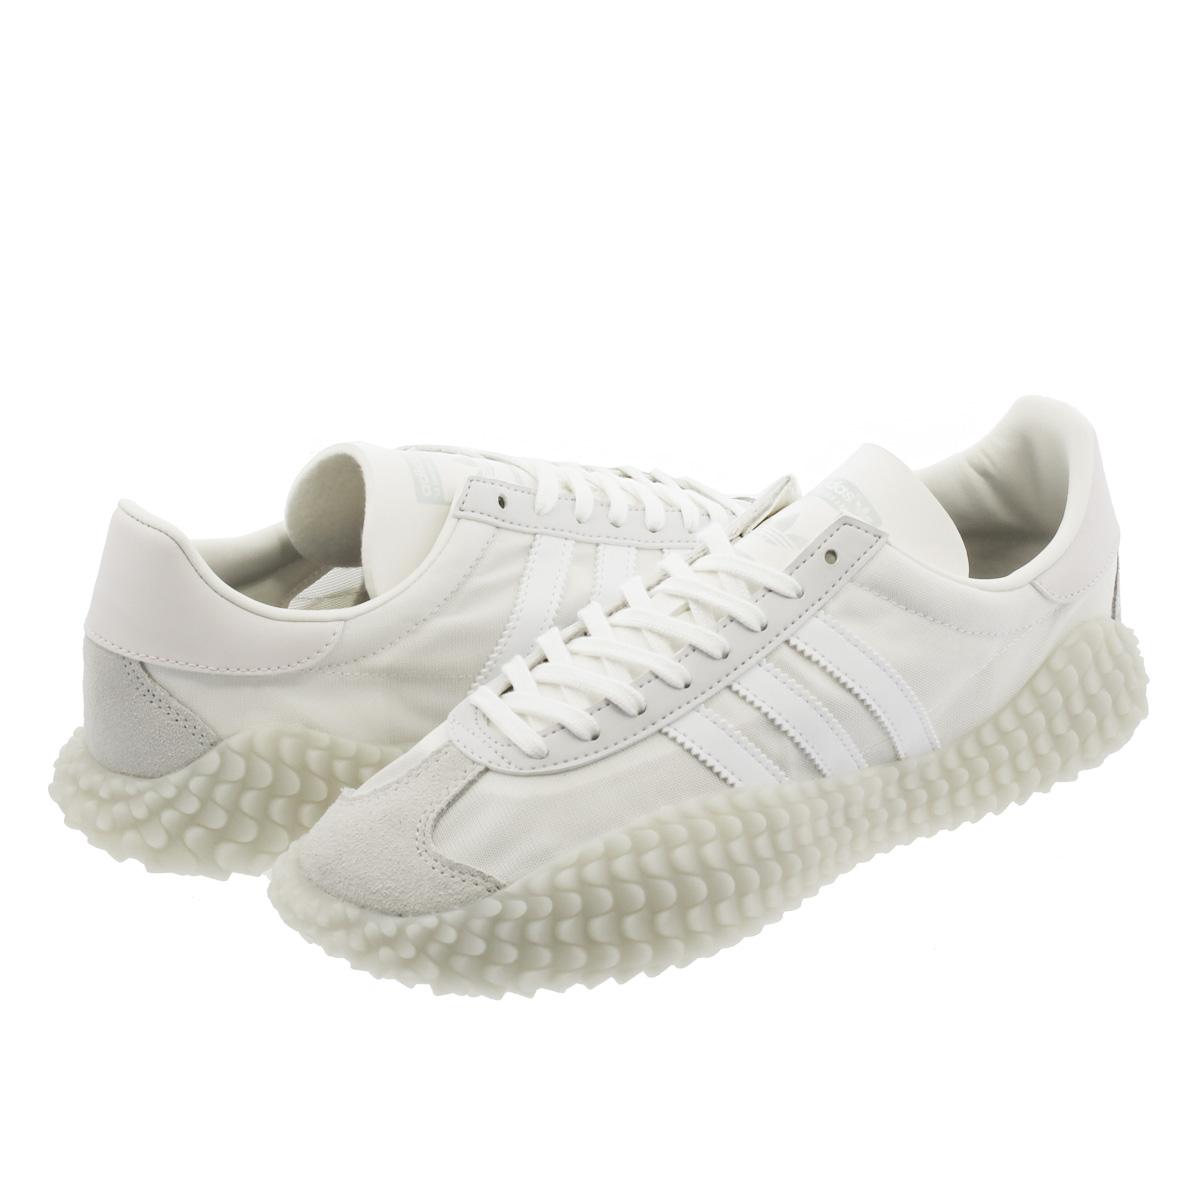 ca2a12bf3ac6 SELECT SHOP LOWTEX  adidas COUNTRY X KAMANDA Adidas country X カマンダ CLOUD  WHITE RUNNING WHITE GREY ONE g27825